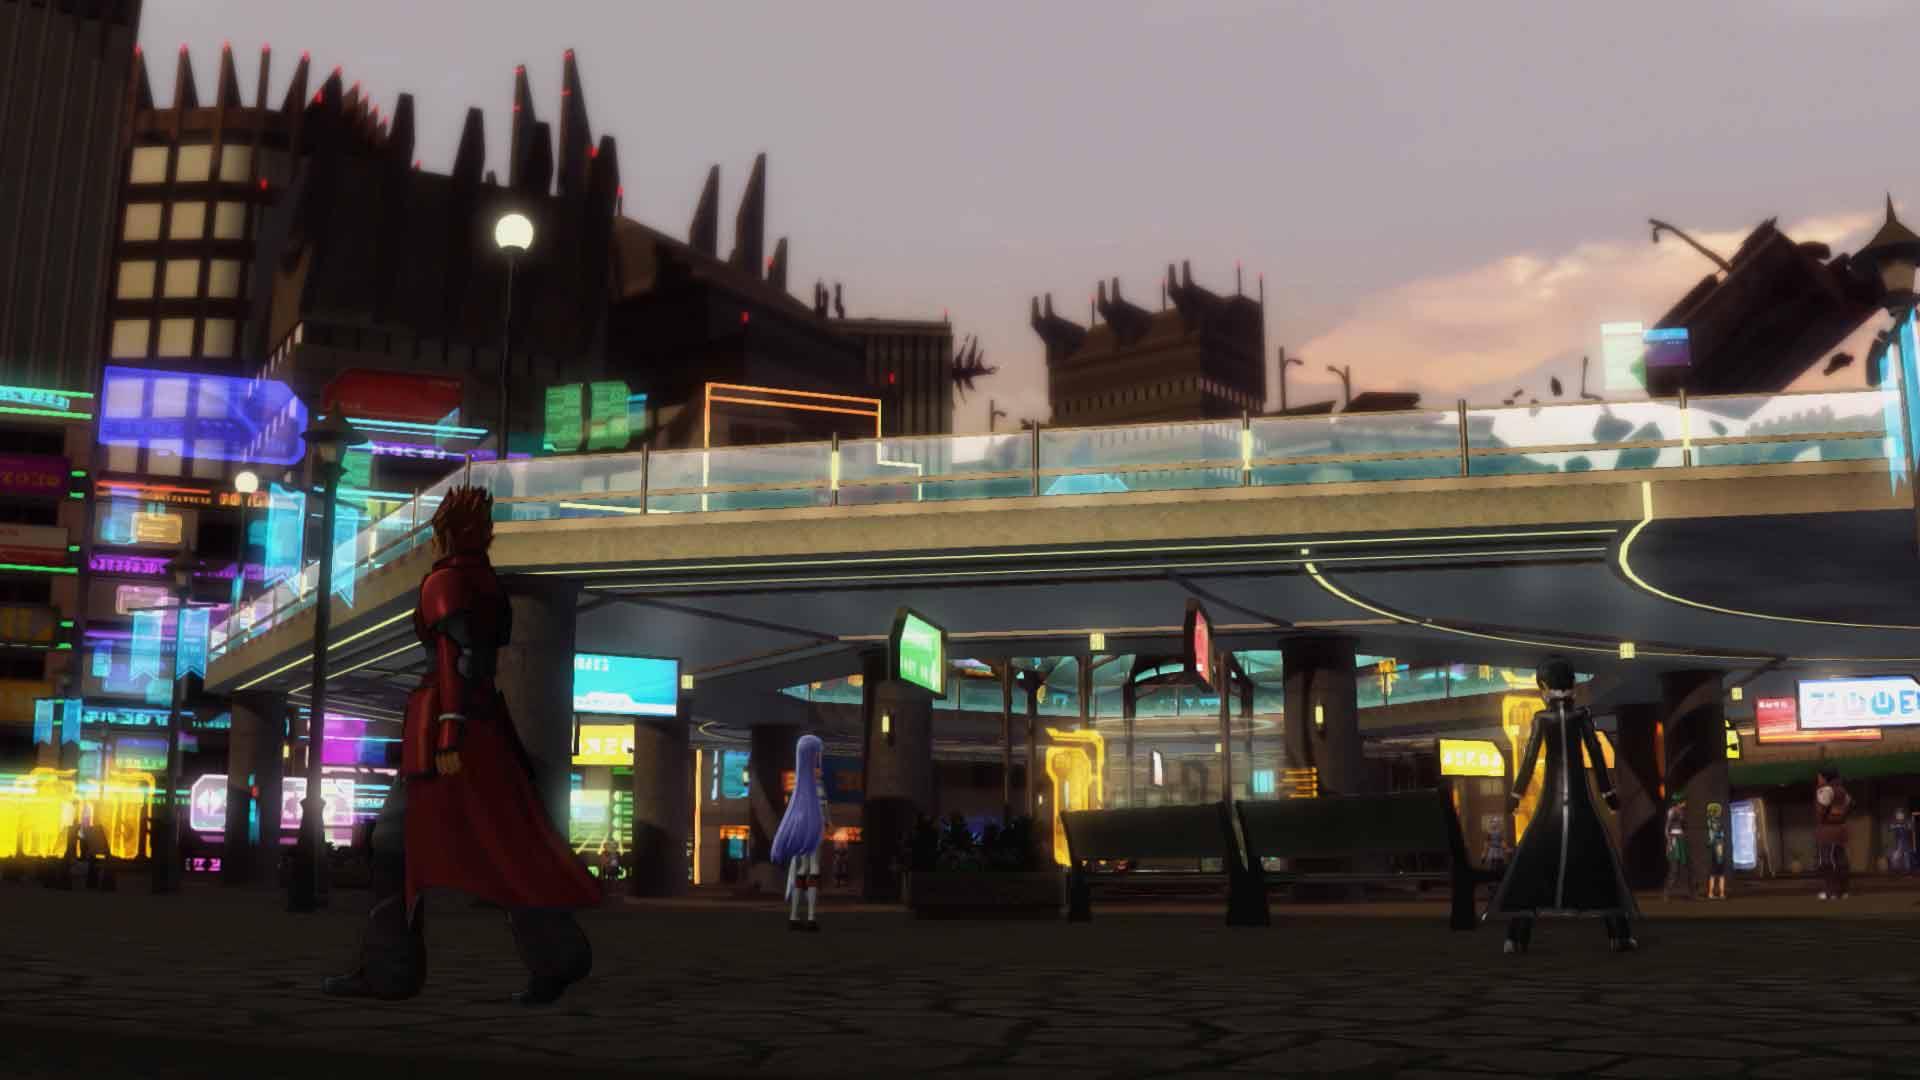 Accel World VS. Sword Art Online Deluxe Edition game image